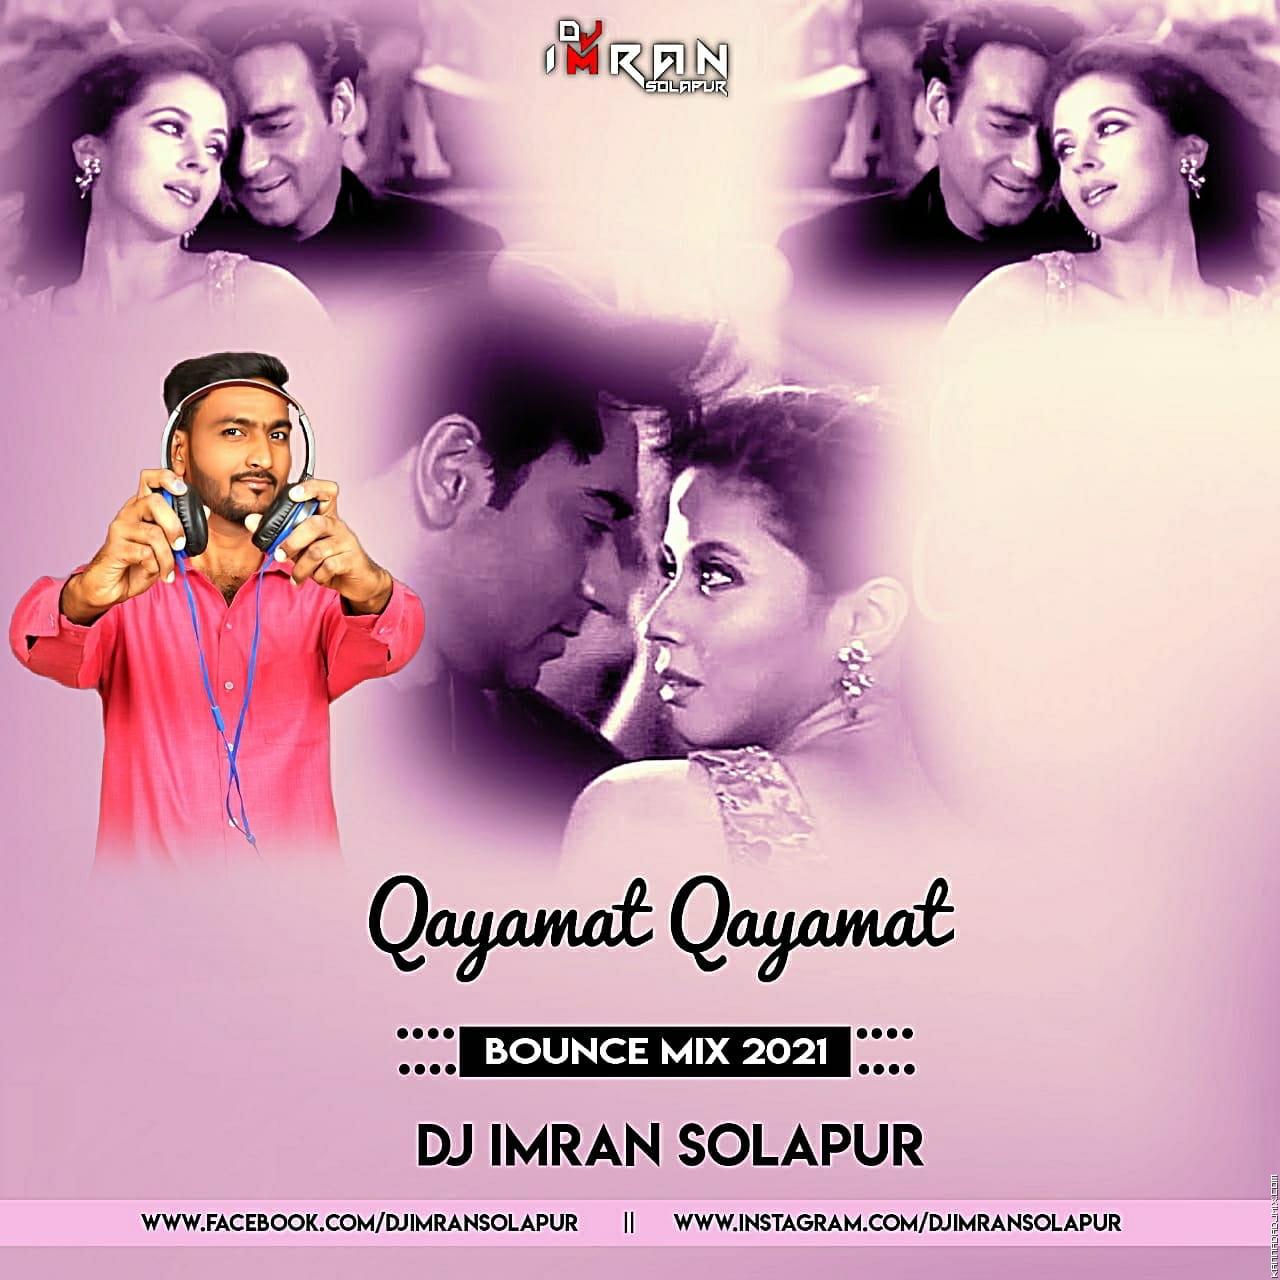 Qayamat Qayamat (2000) Bounce Mix 2021 - DJ Imran Solapur.mp3